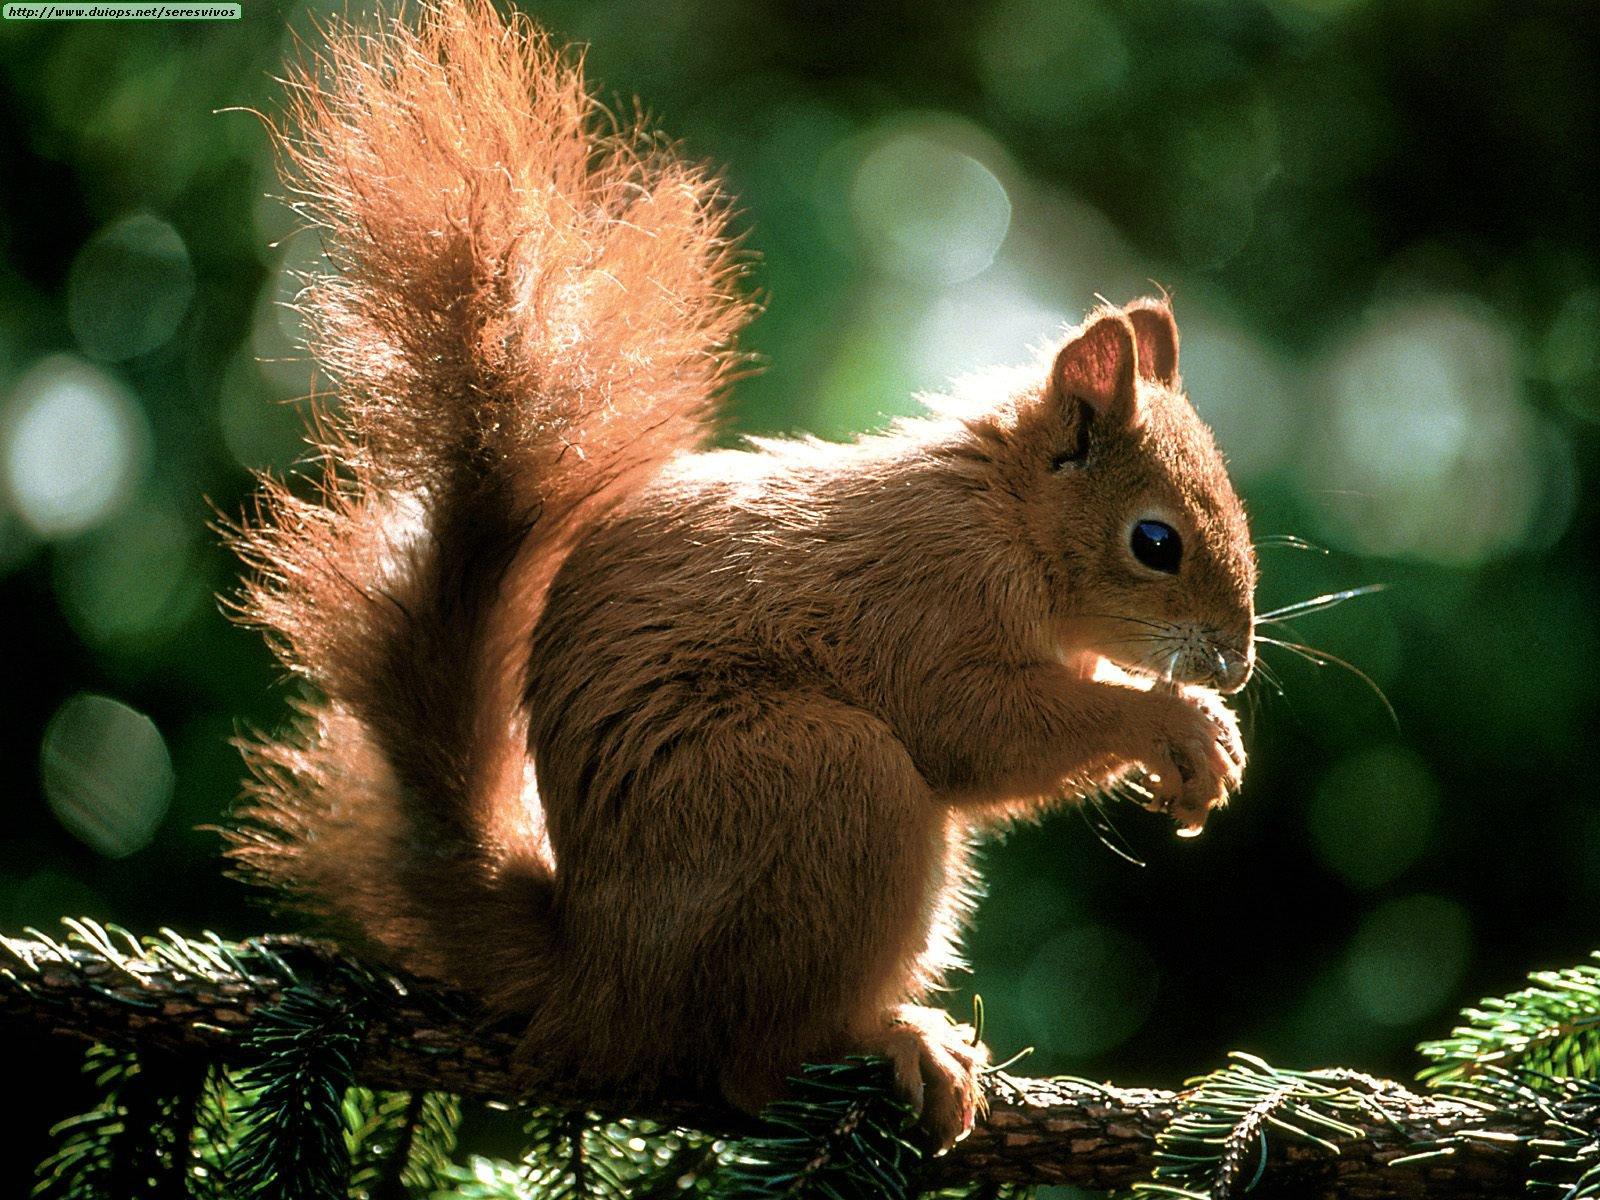 Squirrels photos | 1600 x 1200 jpeg 393kB